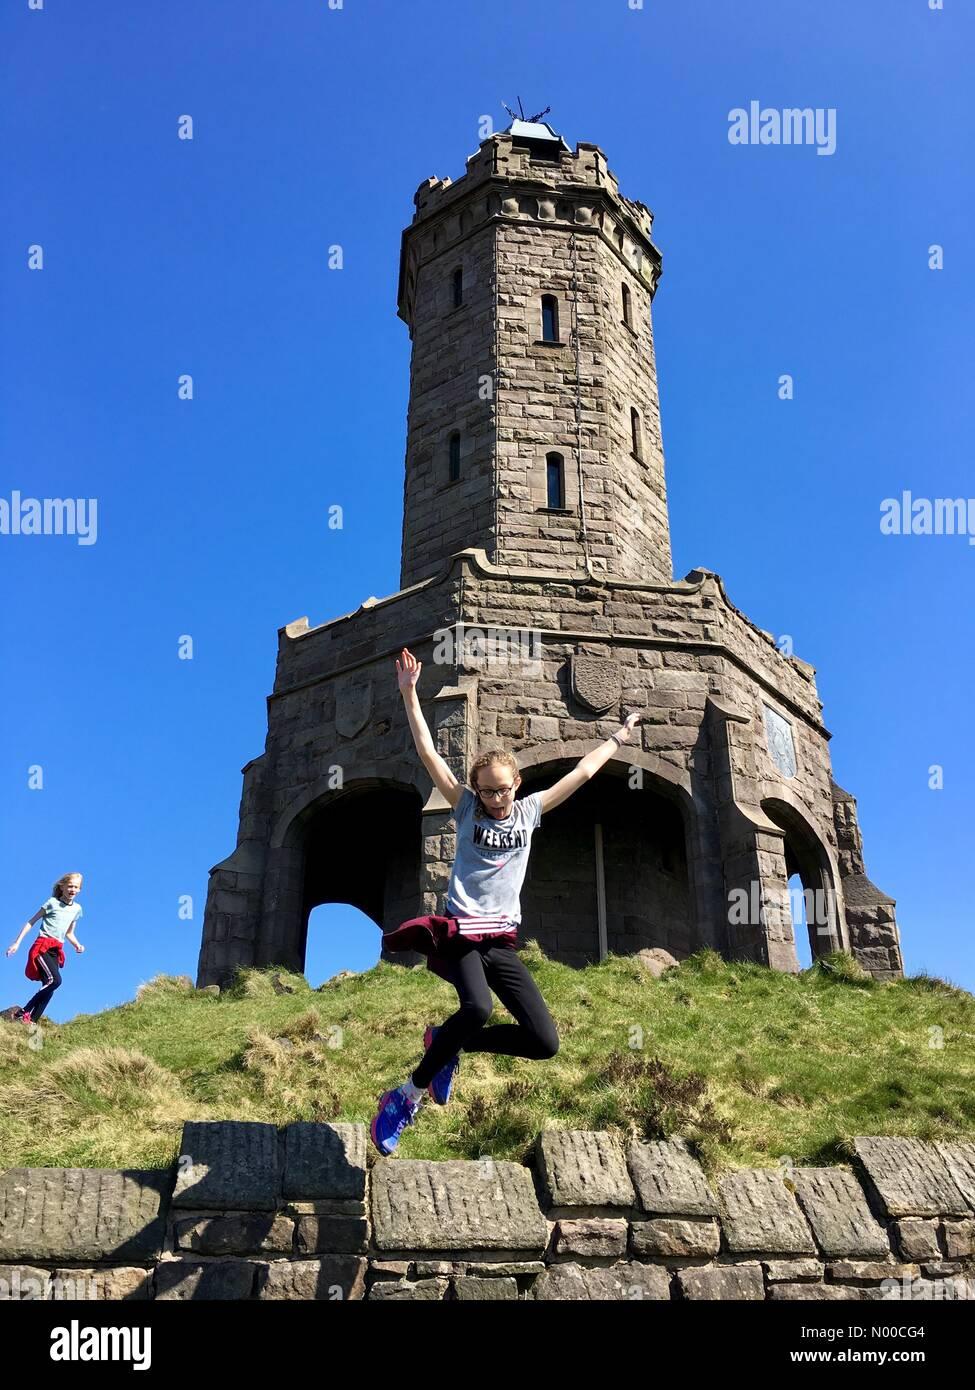 Uk Weather Day In Blackburn Lancashire Two Girls Having Fun In The Sun At Darwen Jubilee Tower On The Moors Above Blackburn